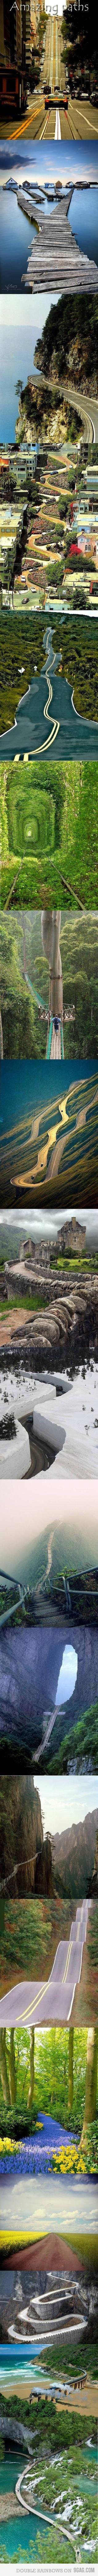 amazing paths...wow!